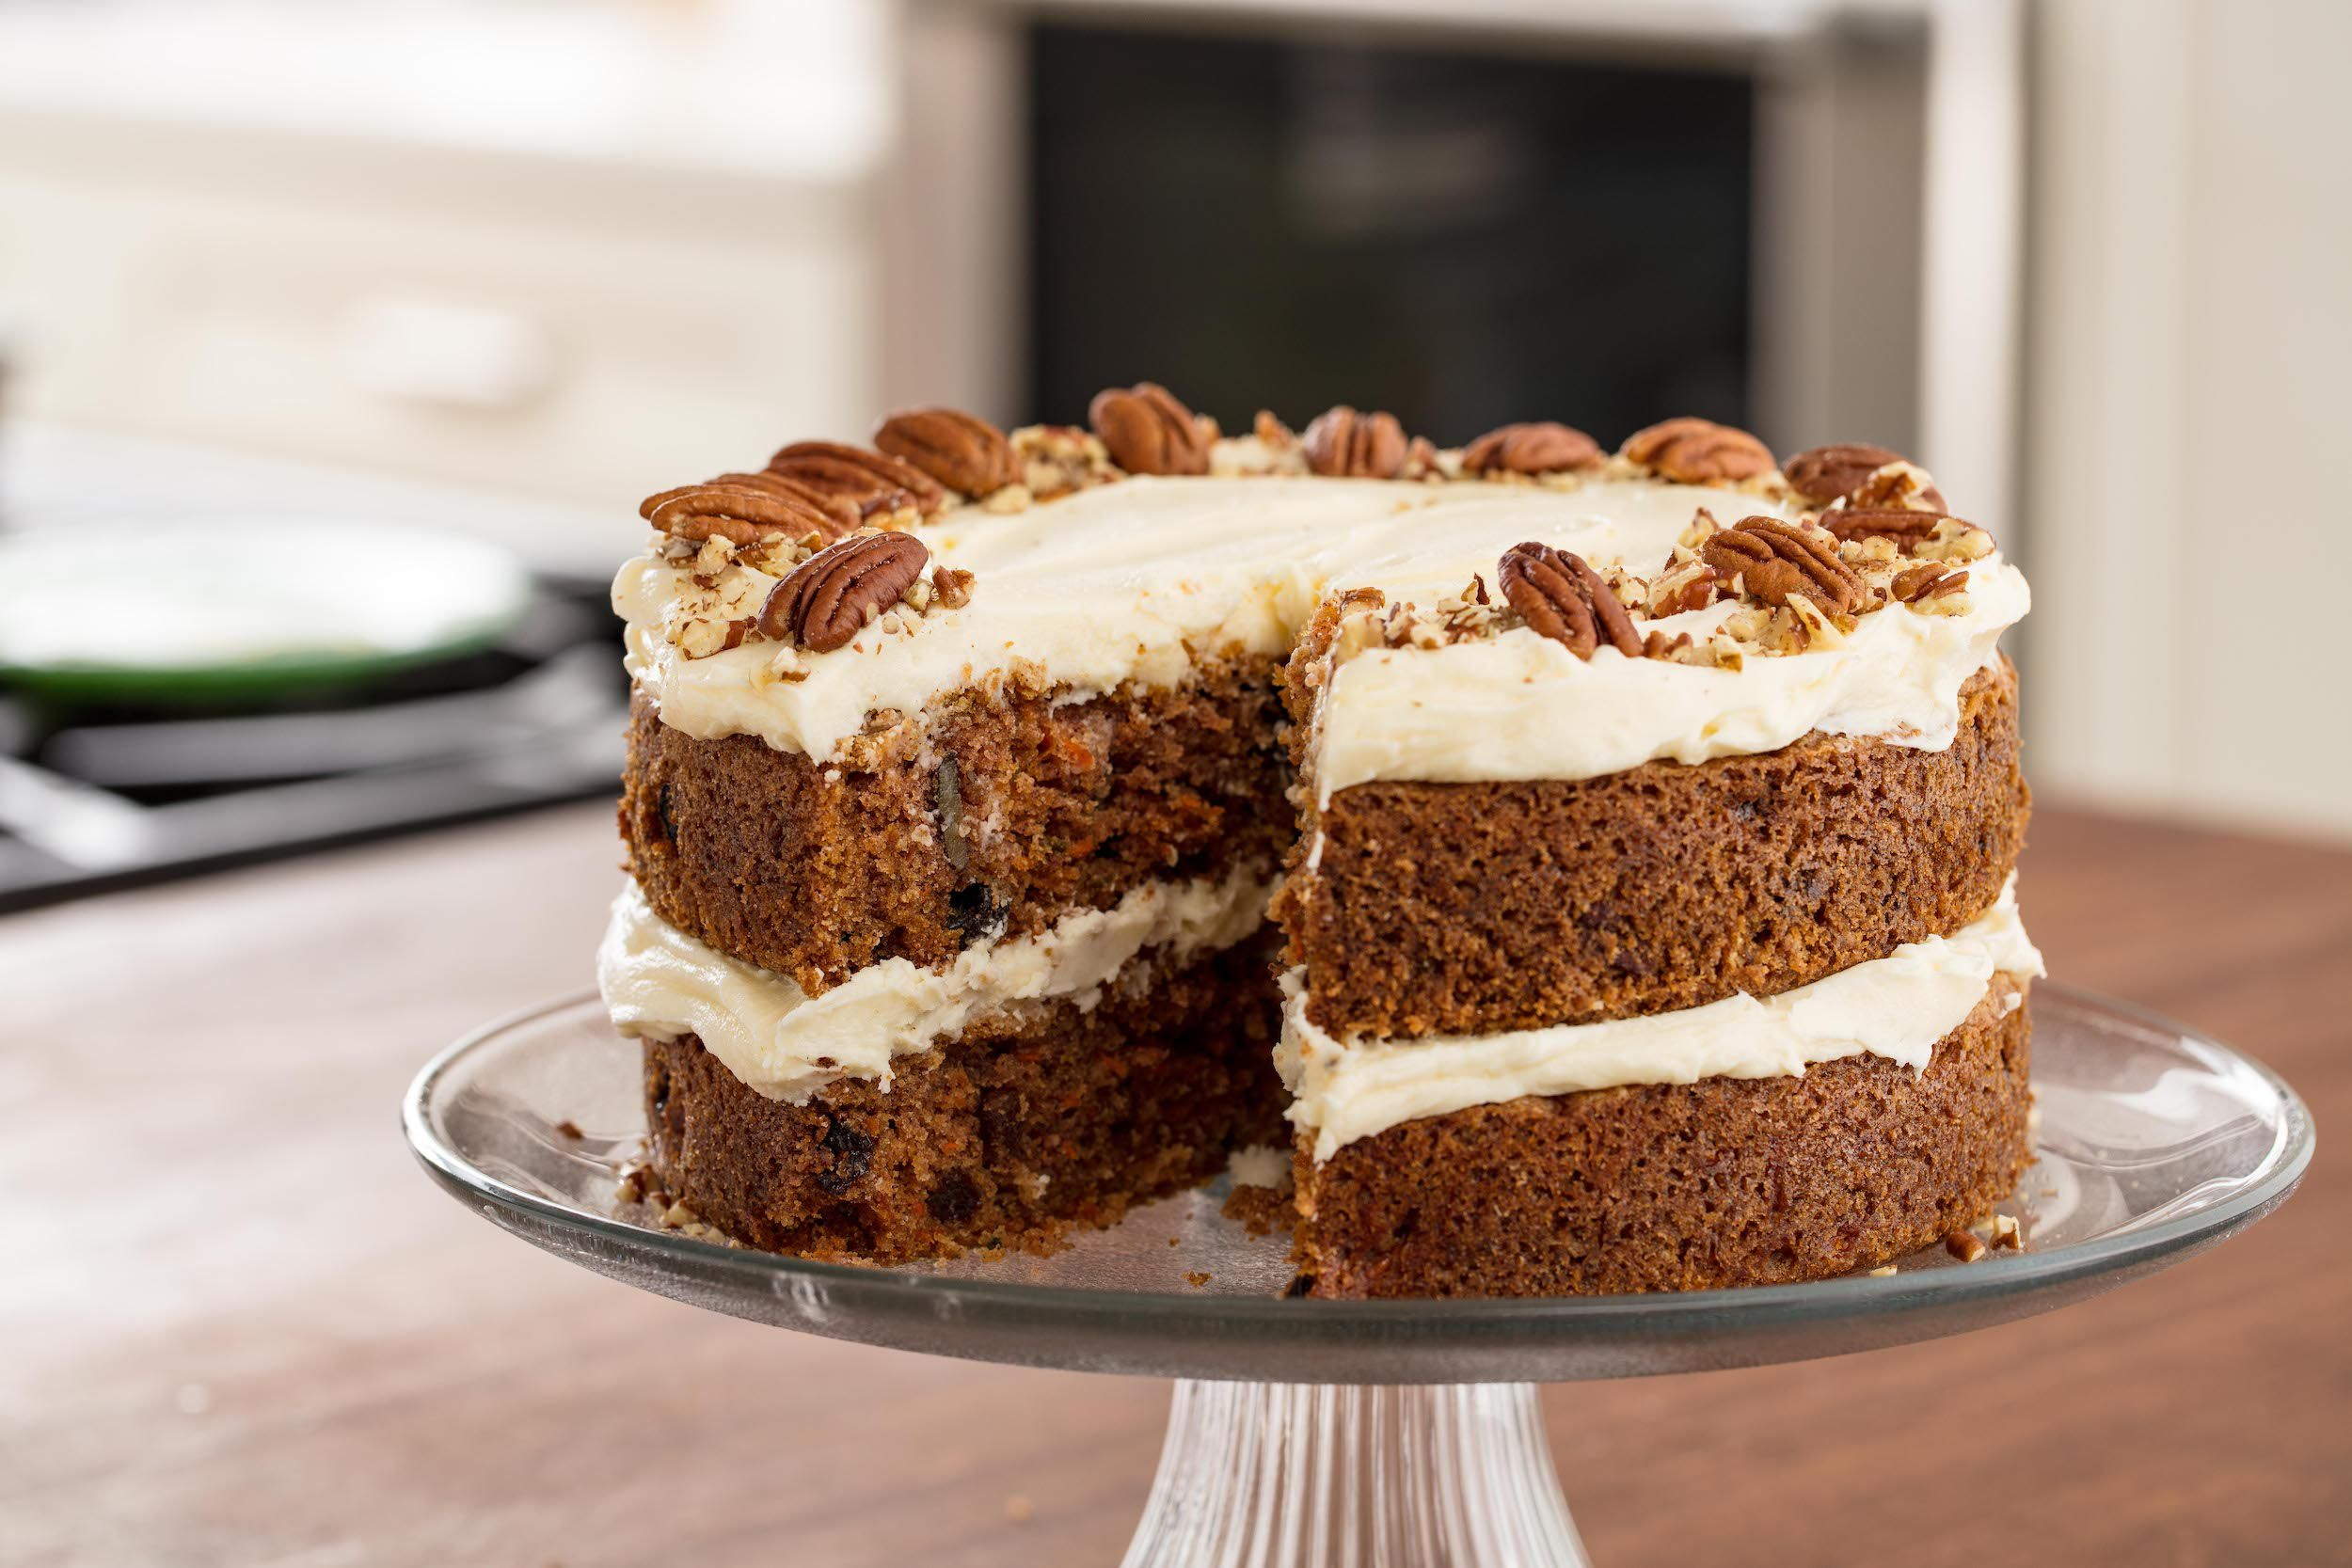 dominique ansel bakery - CARROT CAKE